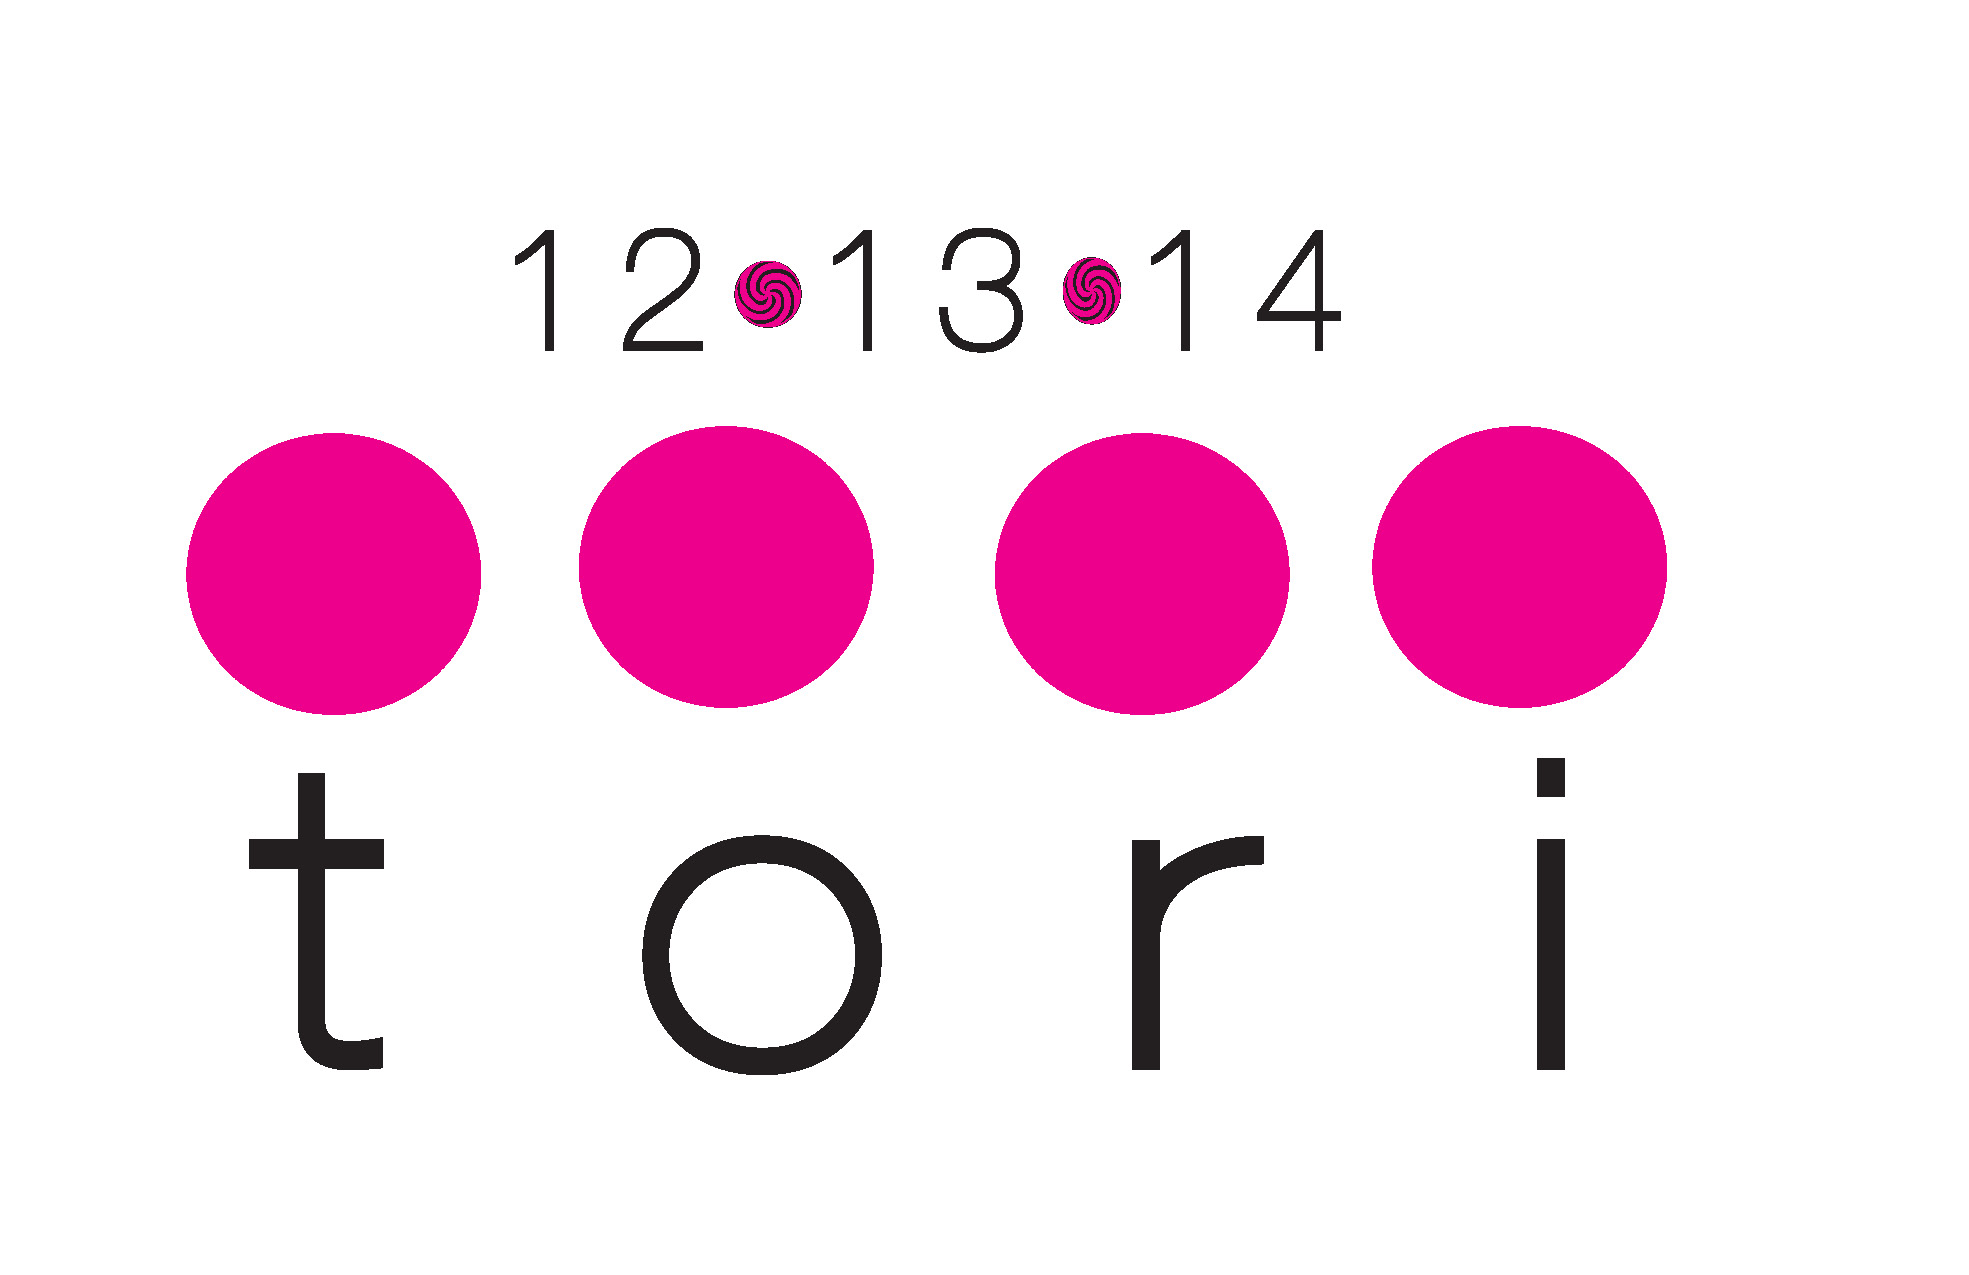 Tori logoFINALS_Page_15.jpg